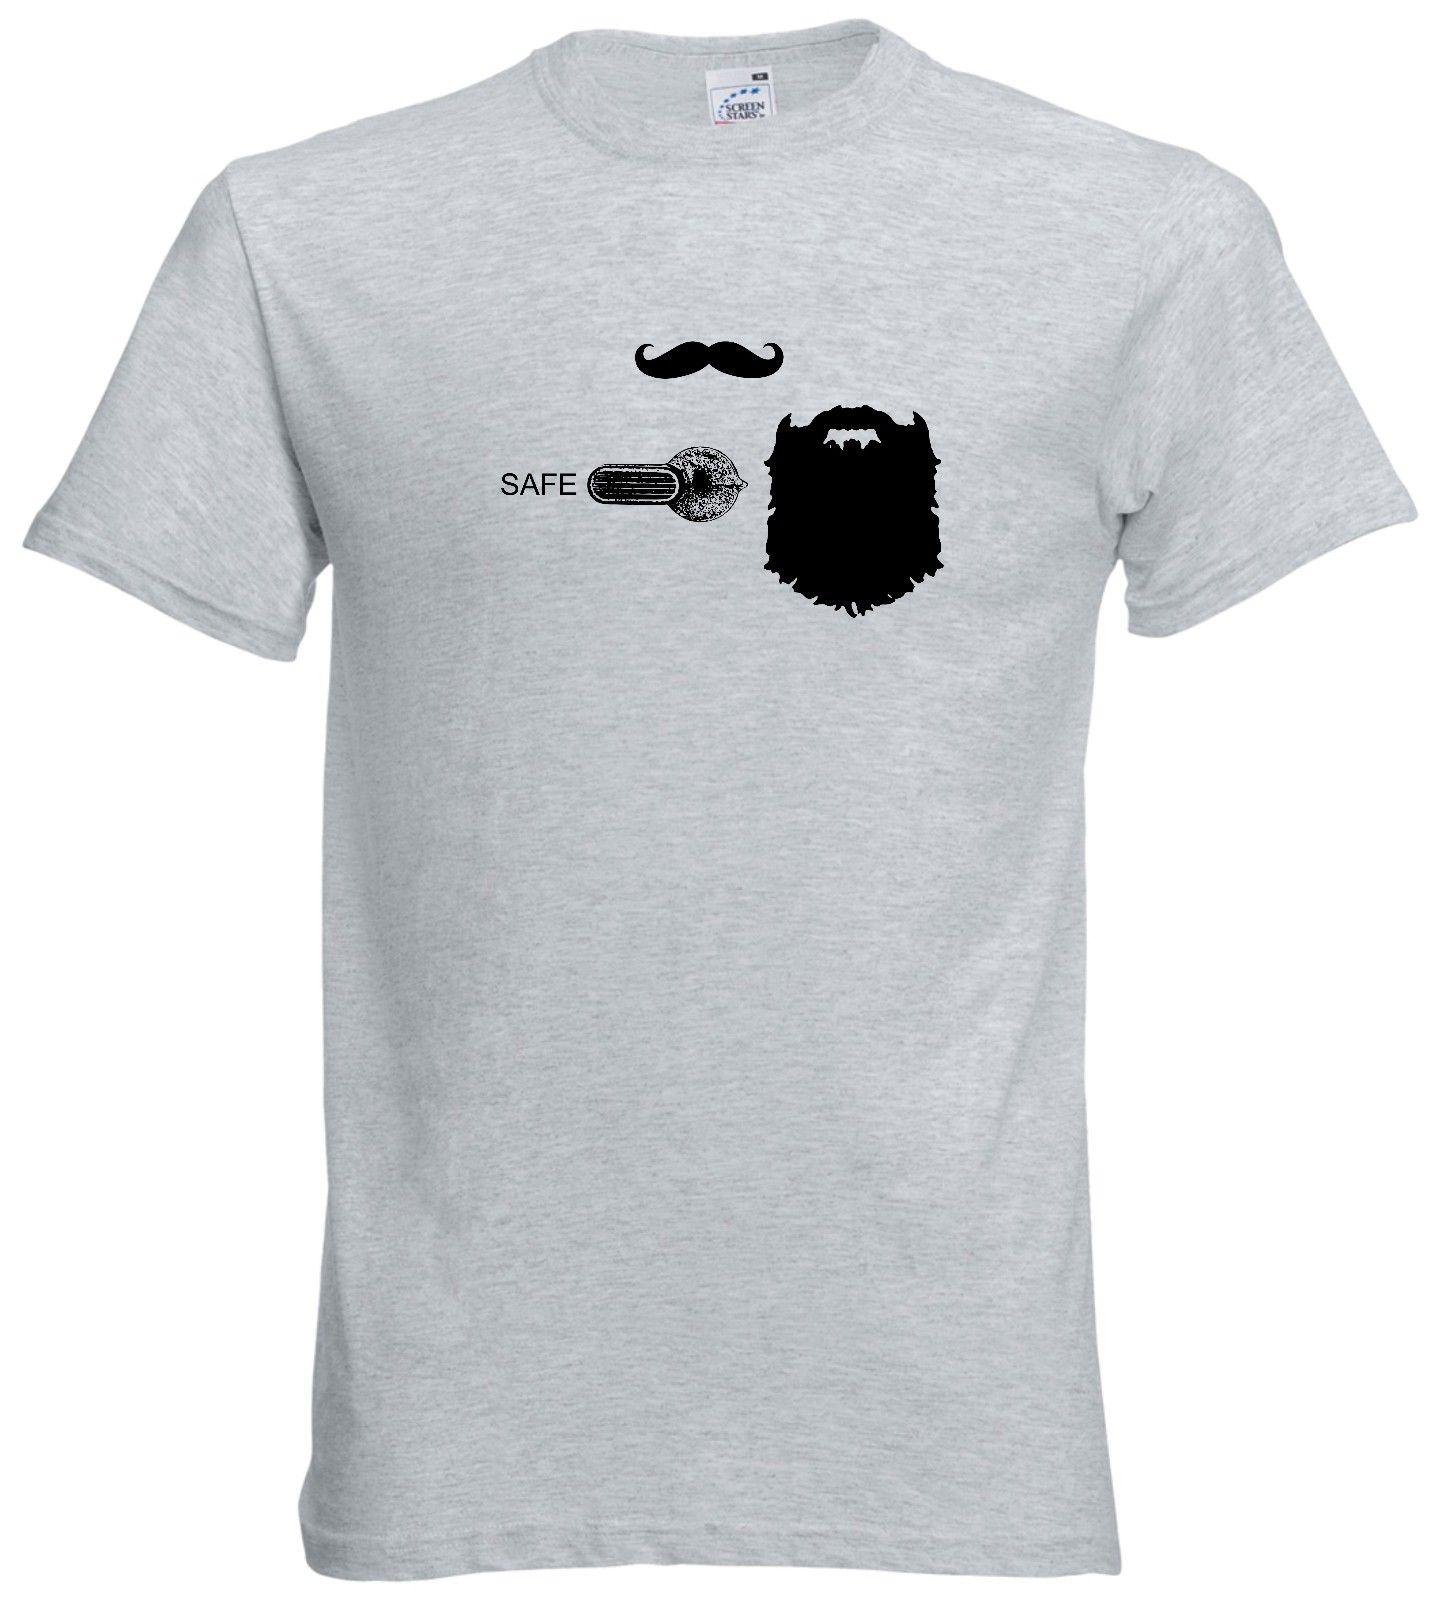 2019 gran oferta 240 años de libertad 1776-2016 camiseta M4 carabine Brown Bess 2ª enmienda camiseta